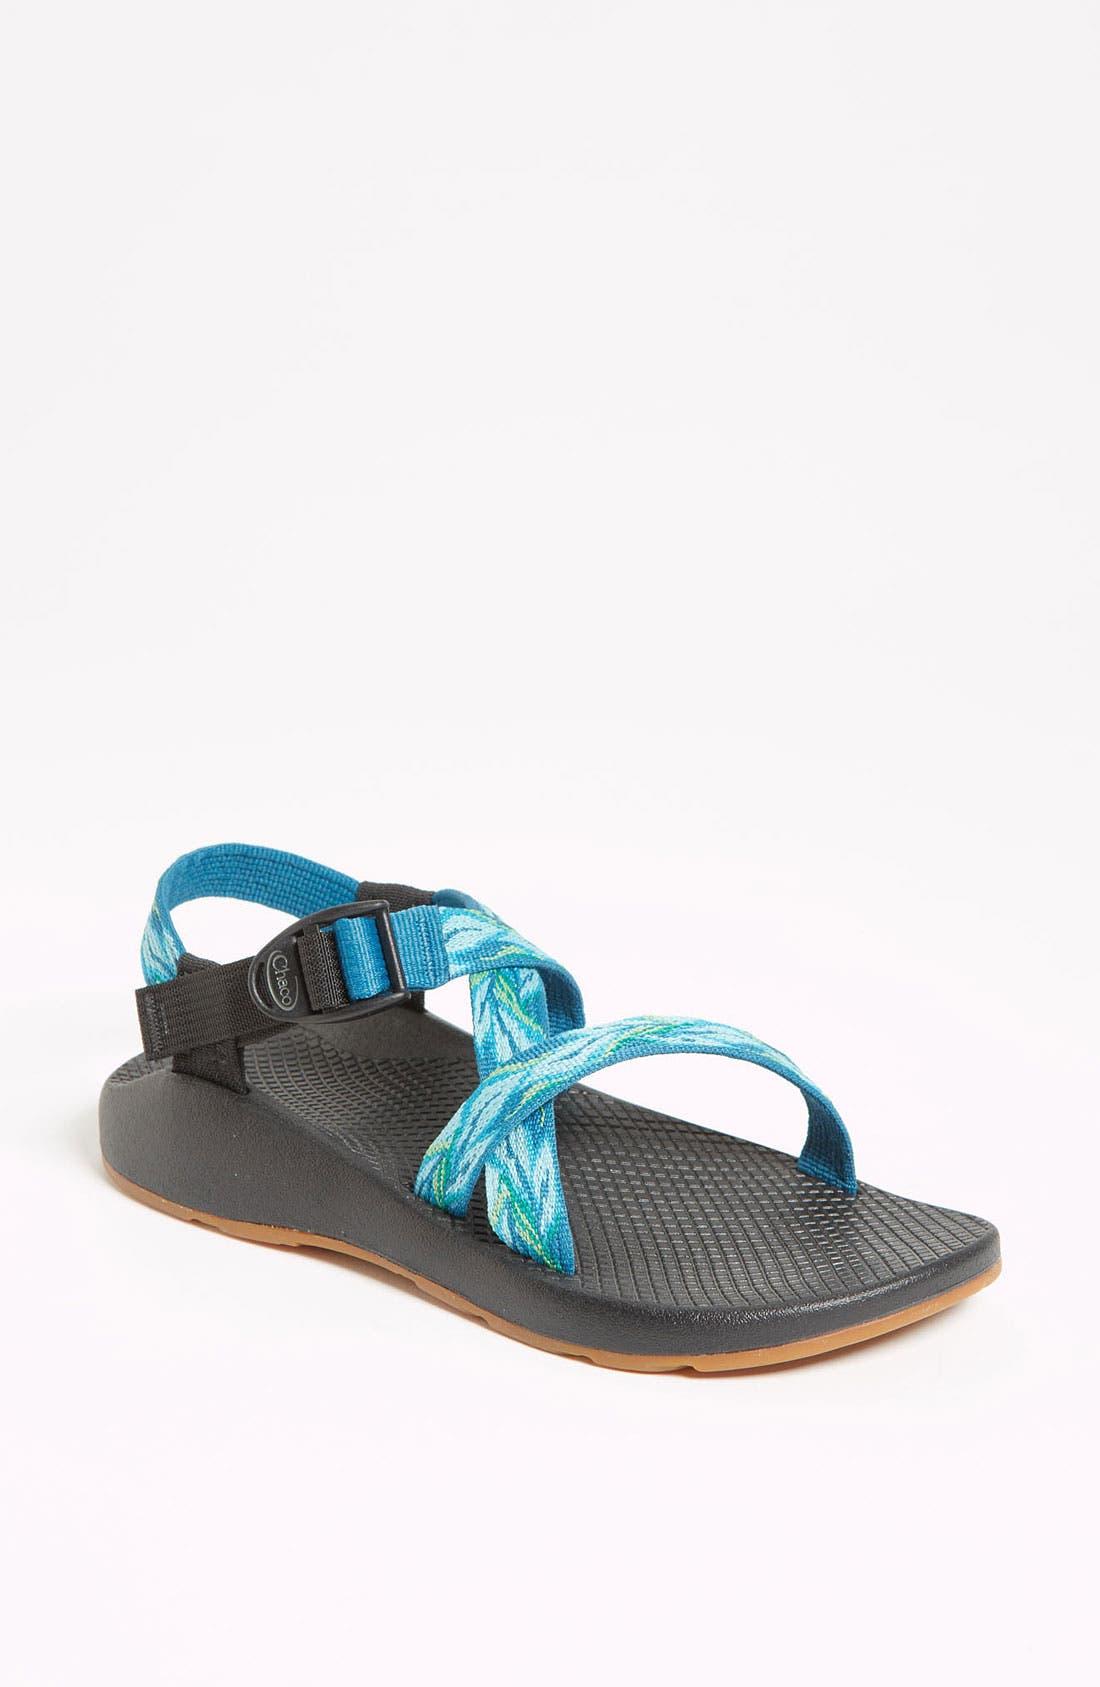 Main Image - Chaco 'ZX2 Yampa' Sandal